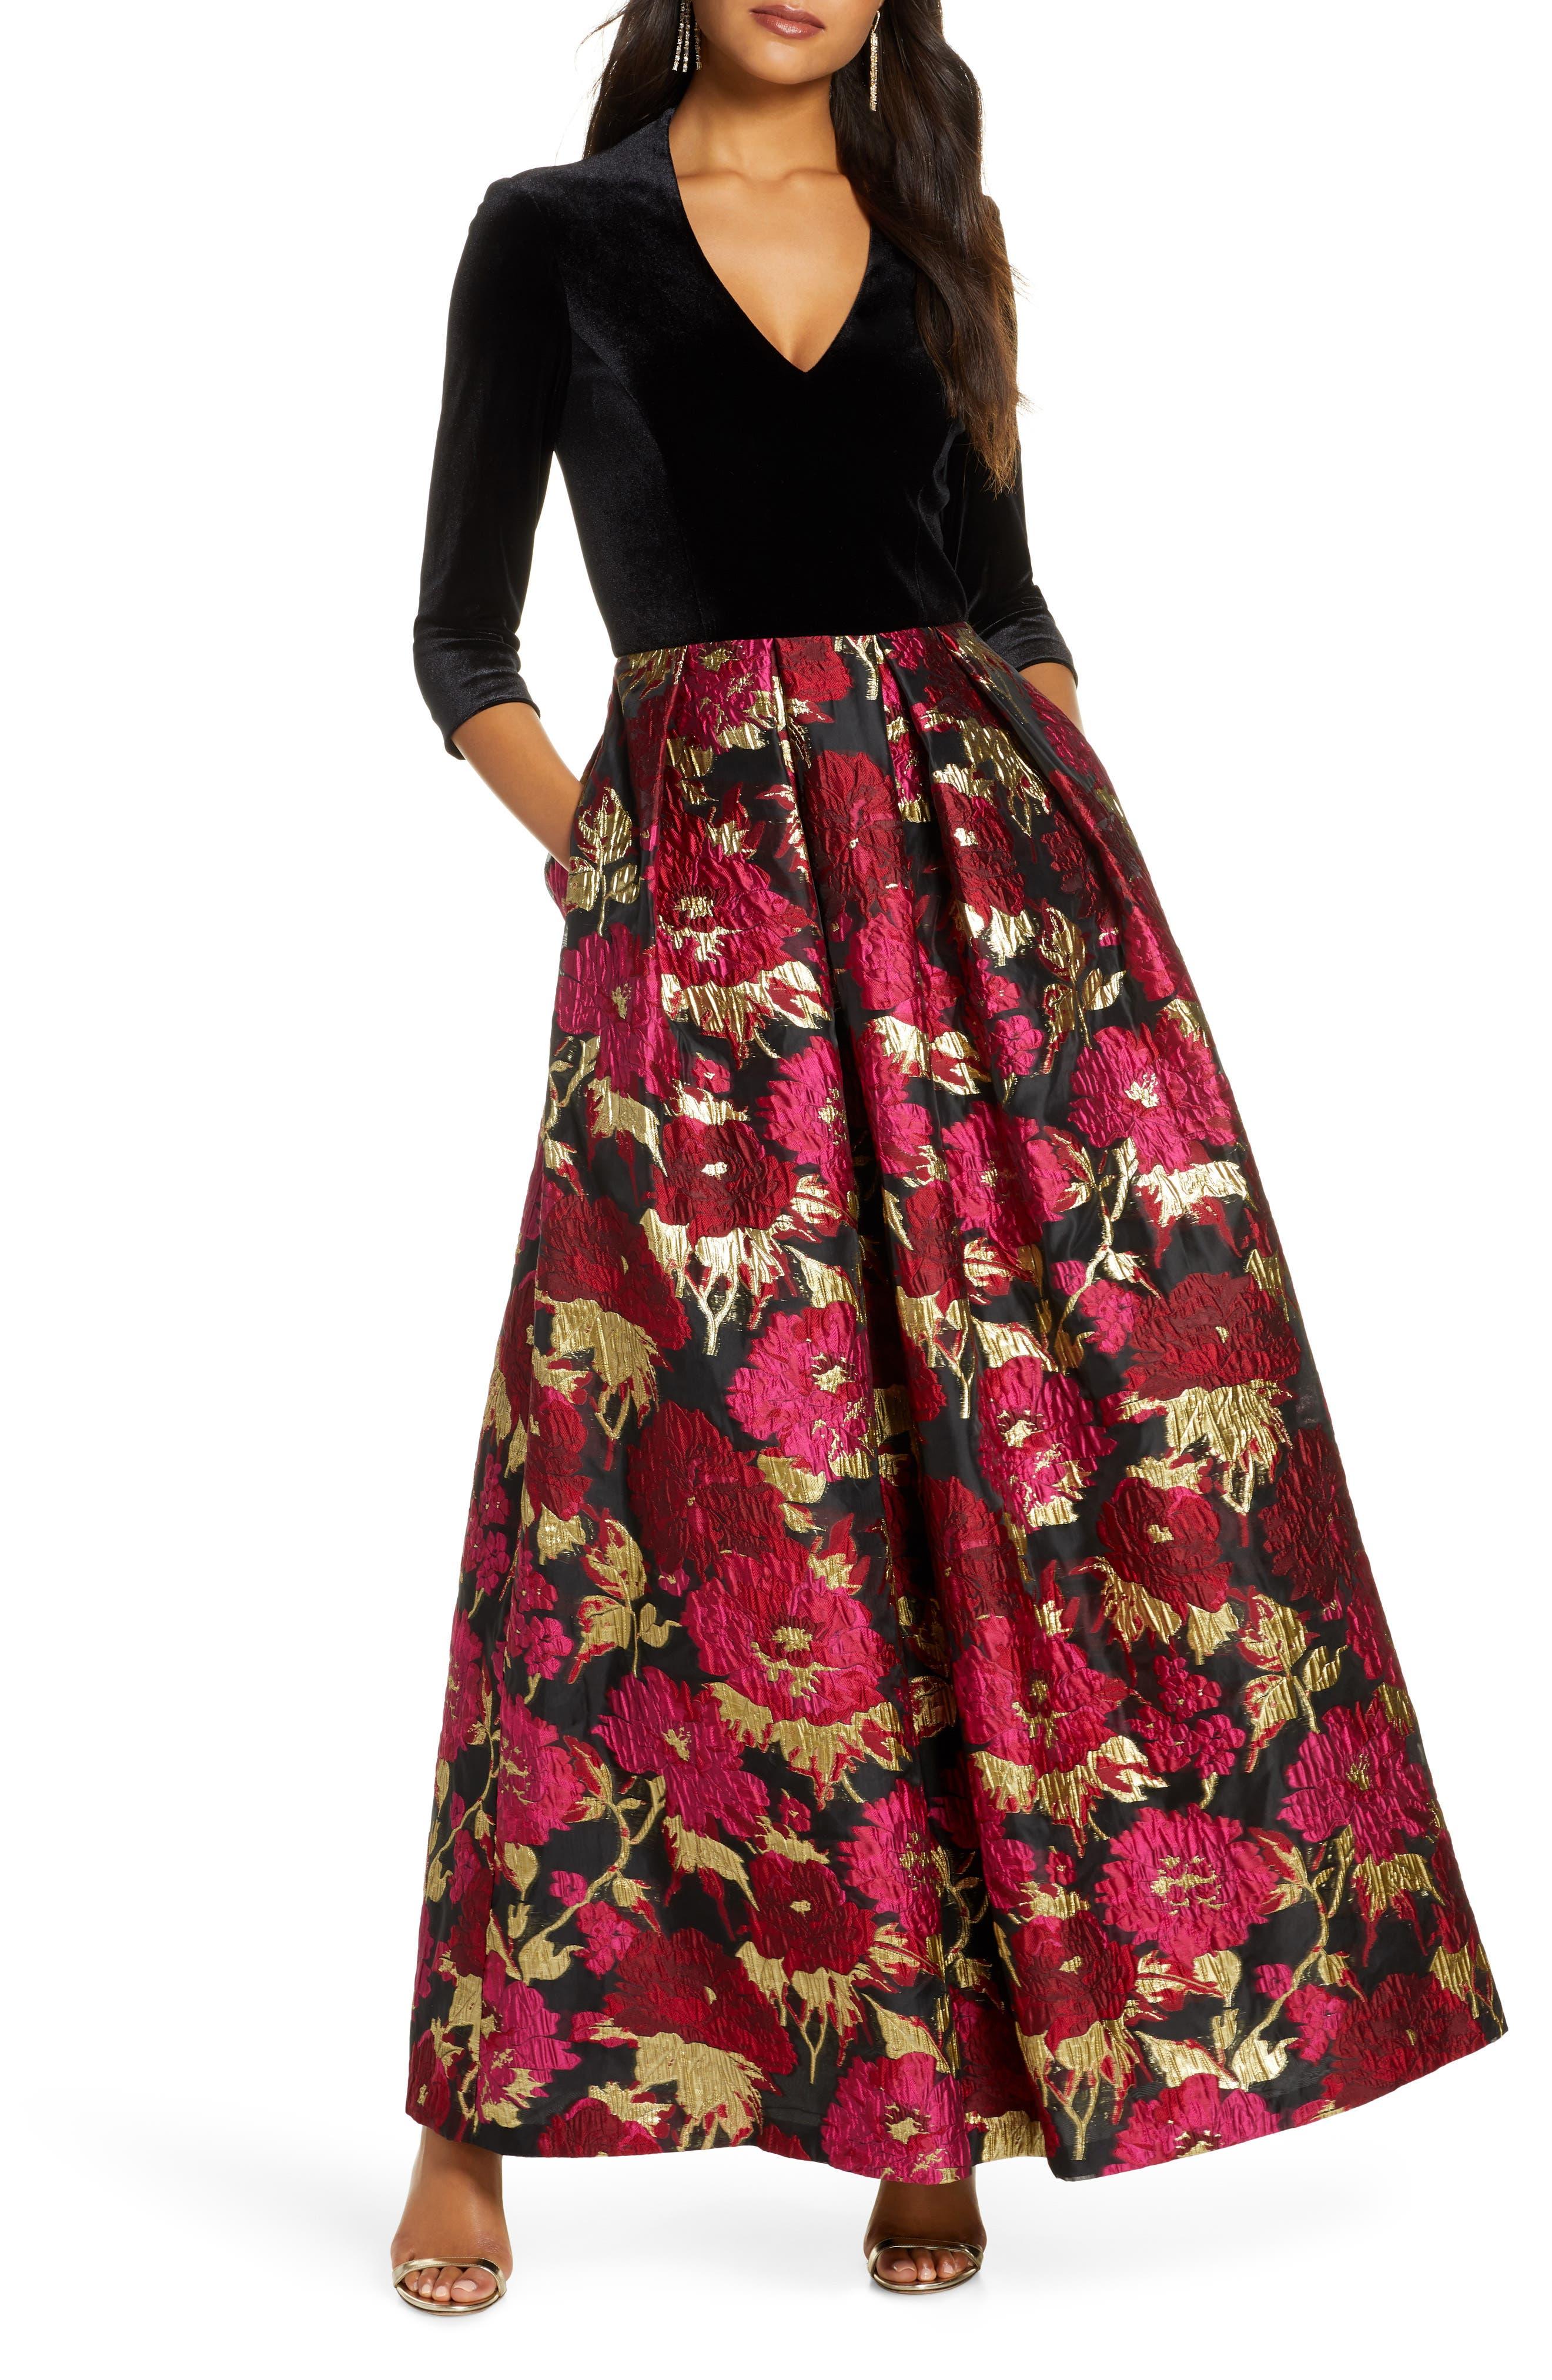 1960s Evening Dresses, Bridesmaids, Mothers Gowns Womens Eliza J Velvet  Floral Jacquard Ballgown $248.00 AT vintagedancer.com